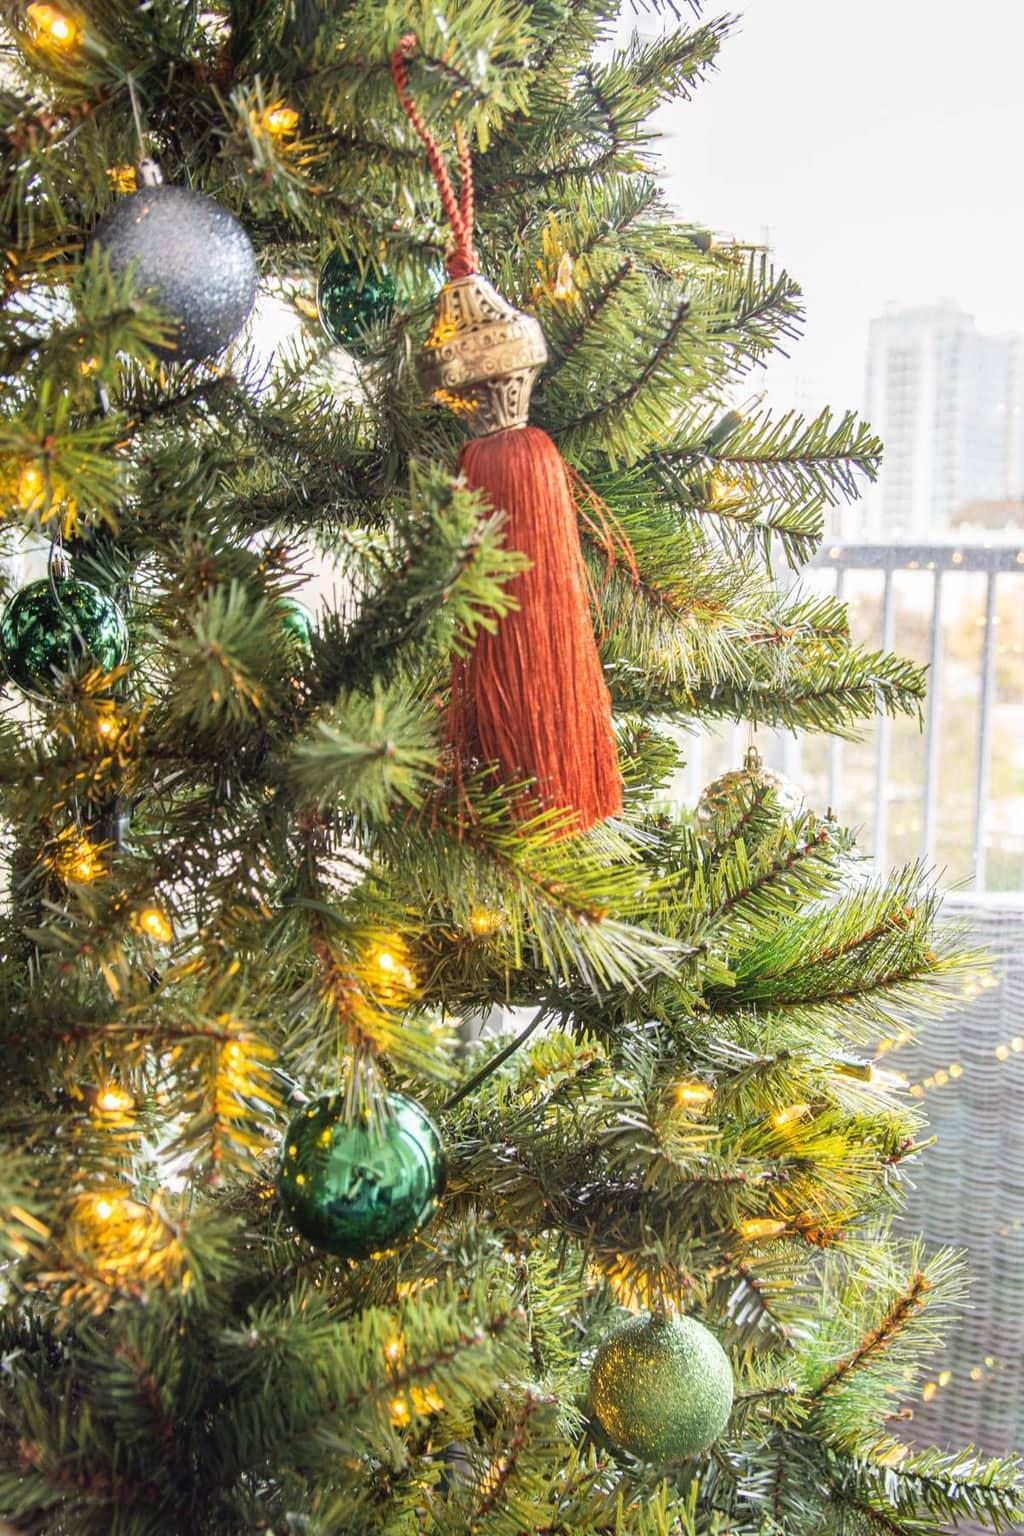 Meghan S Jewel Tone Christmas Tree In Midtown Atlanta Thou Swell